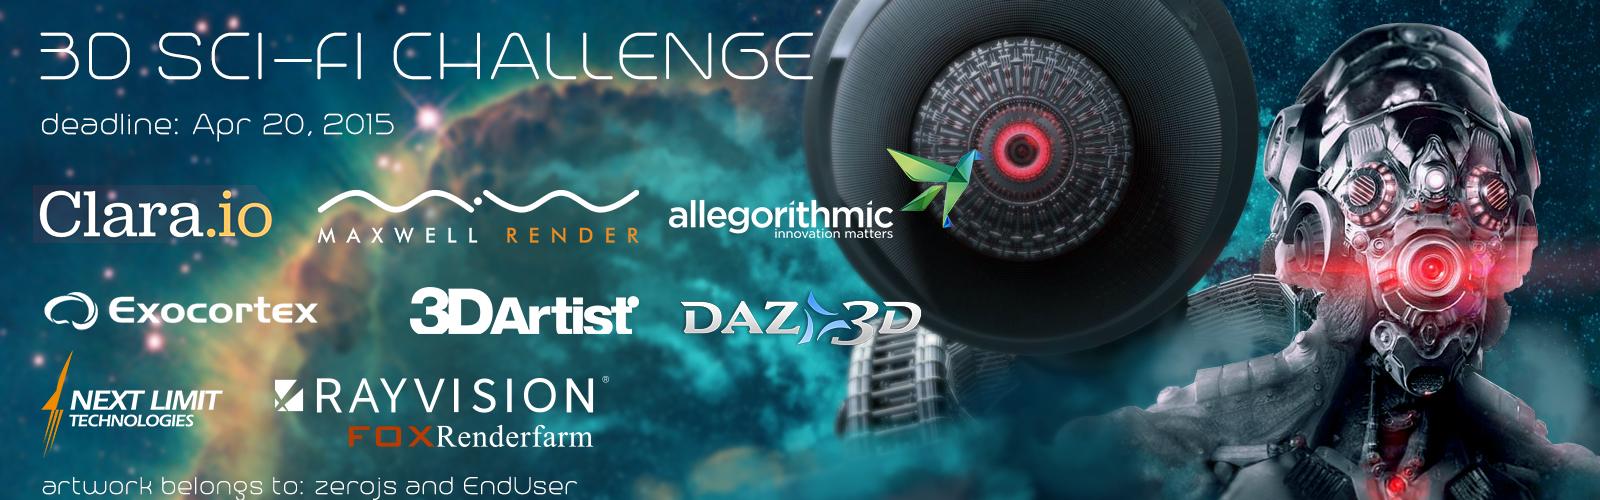 3D Sci-Fi Challenge